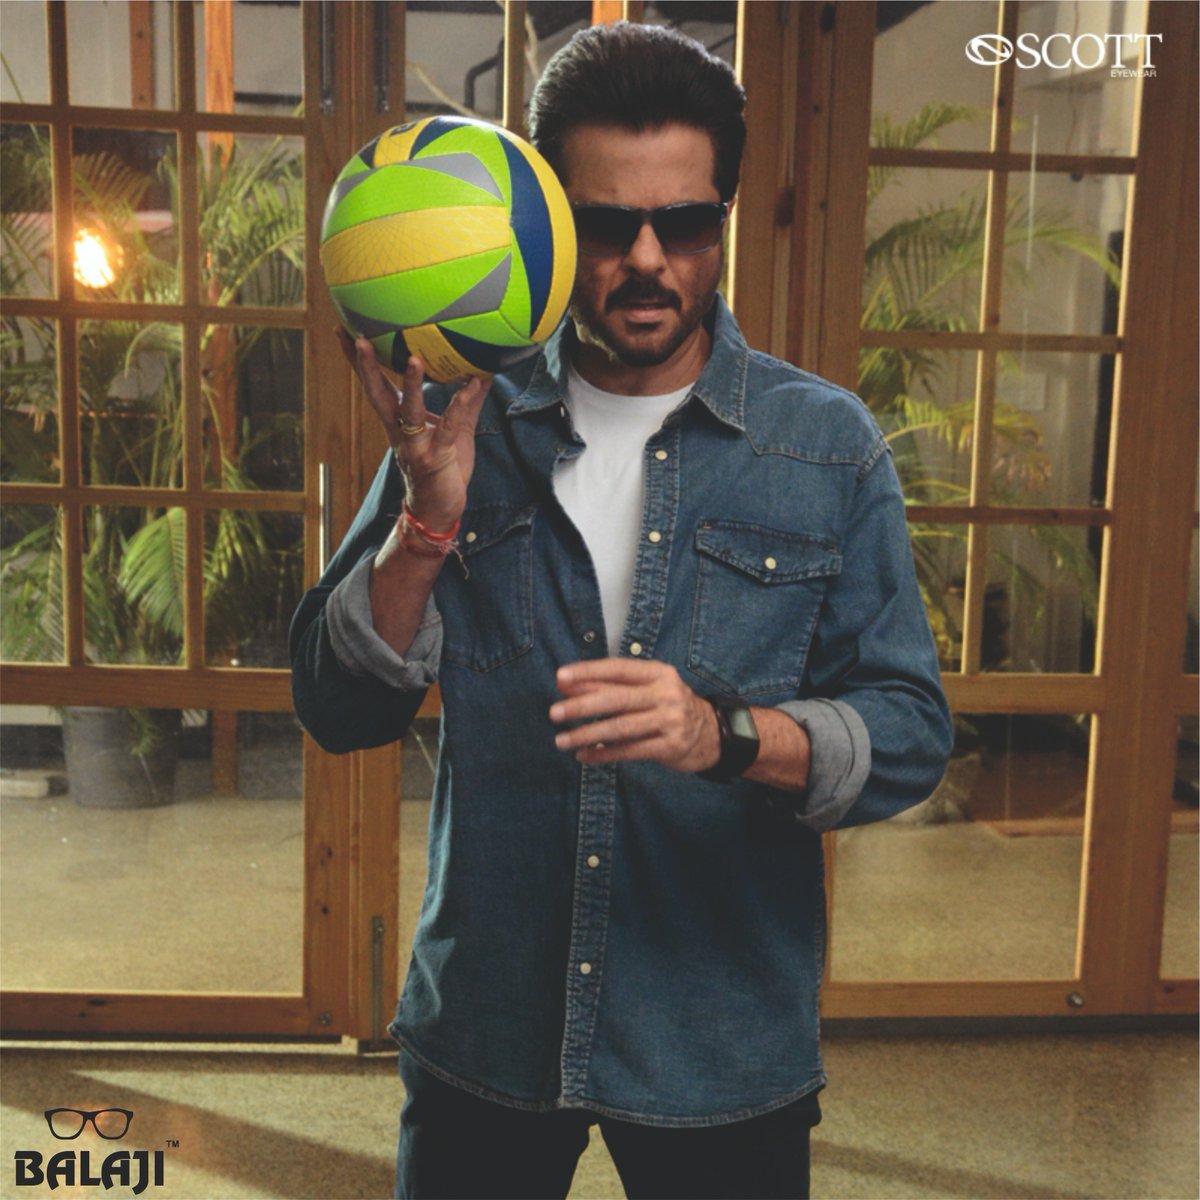 Get sporty with Anil S Kapoor 's jaunty #ScottEyewearXAKSK sunglass looks!  @scotteyewear #ScottSunnies #ISeeYou #Spotted #Scotted #SpotTheScott #BondOverScott #ScottTheSun #AnilKapoor #SonamKapoor #scotteyewear #BalajiOpticalCo. @Balajiopticalco